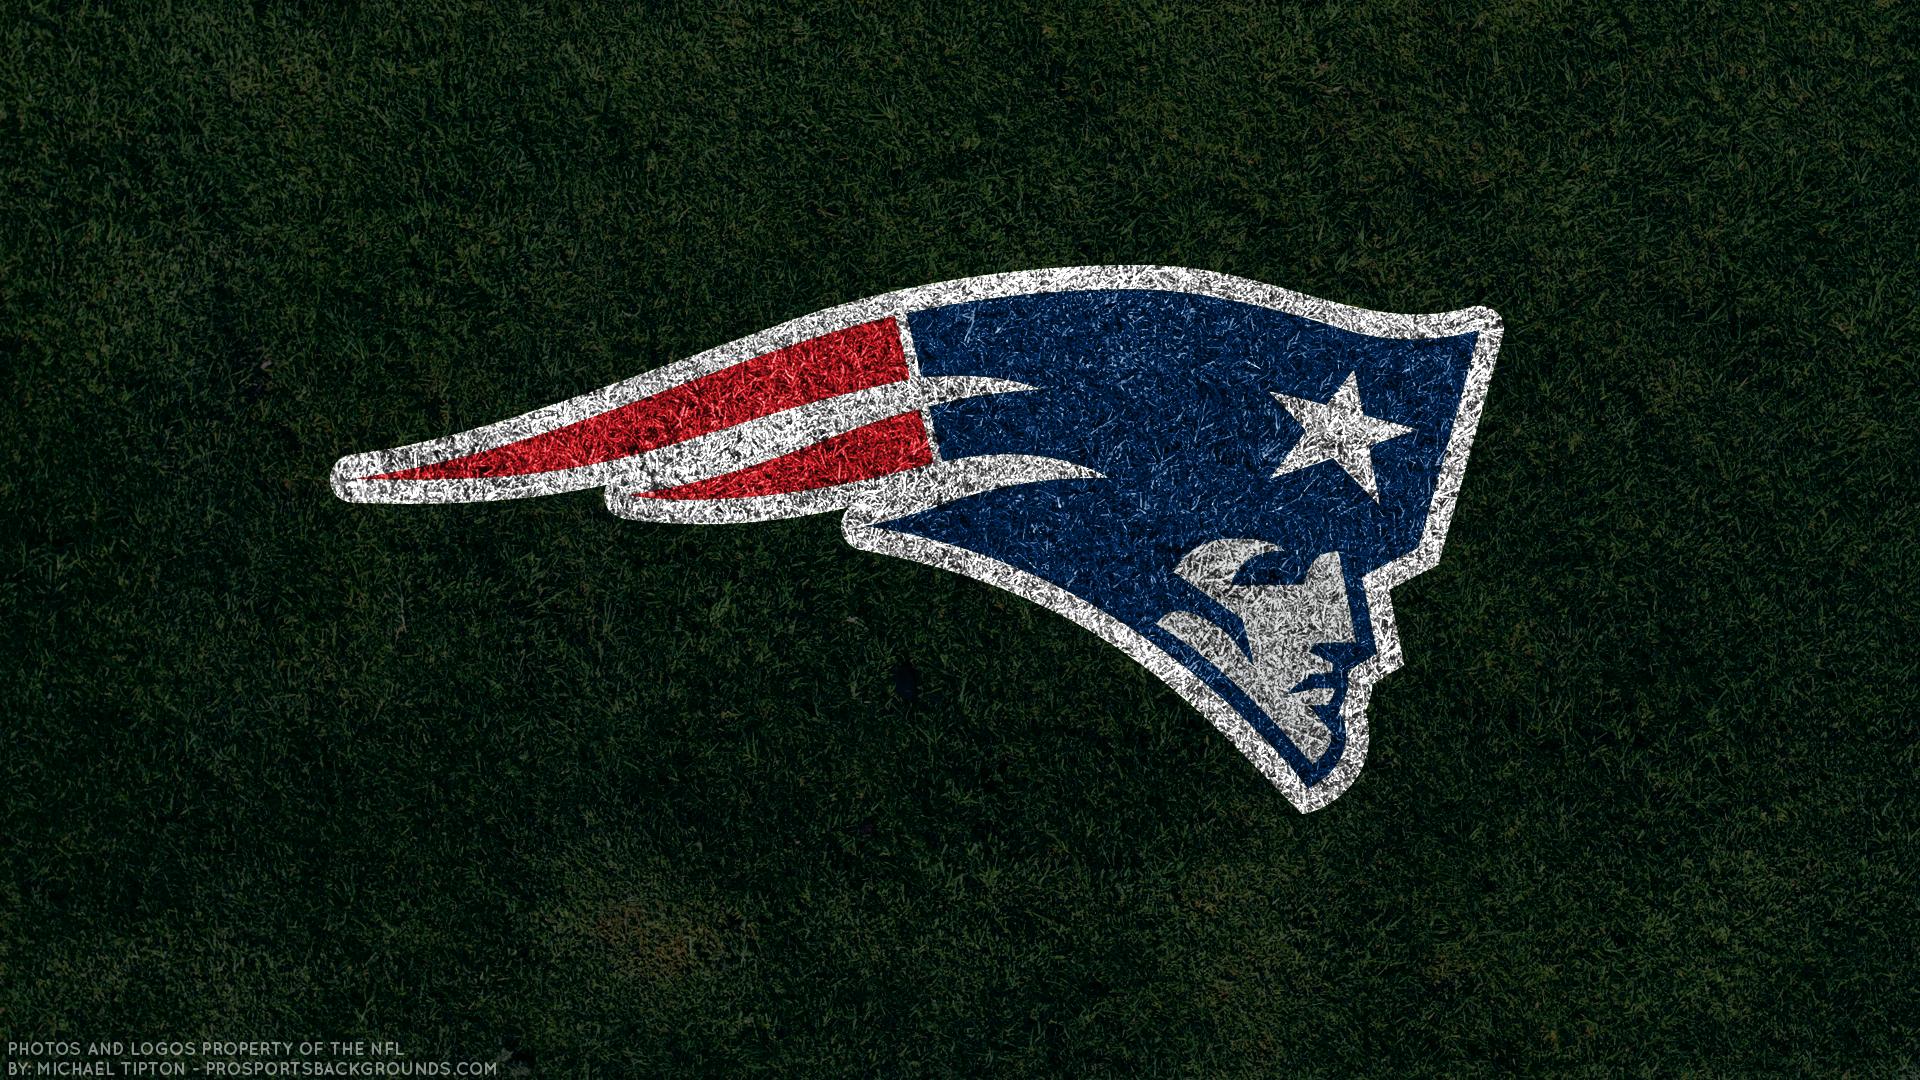 Sport Wallpaper New England Patriots: New England Patriots HD Wallpaper